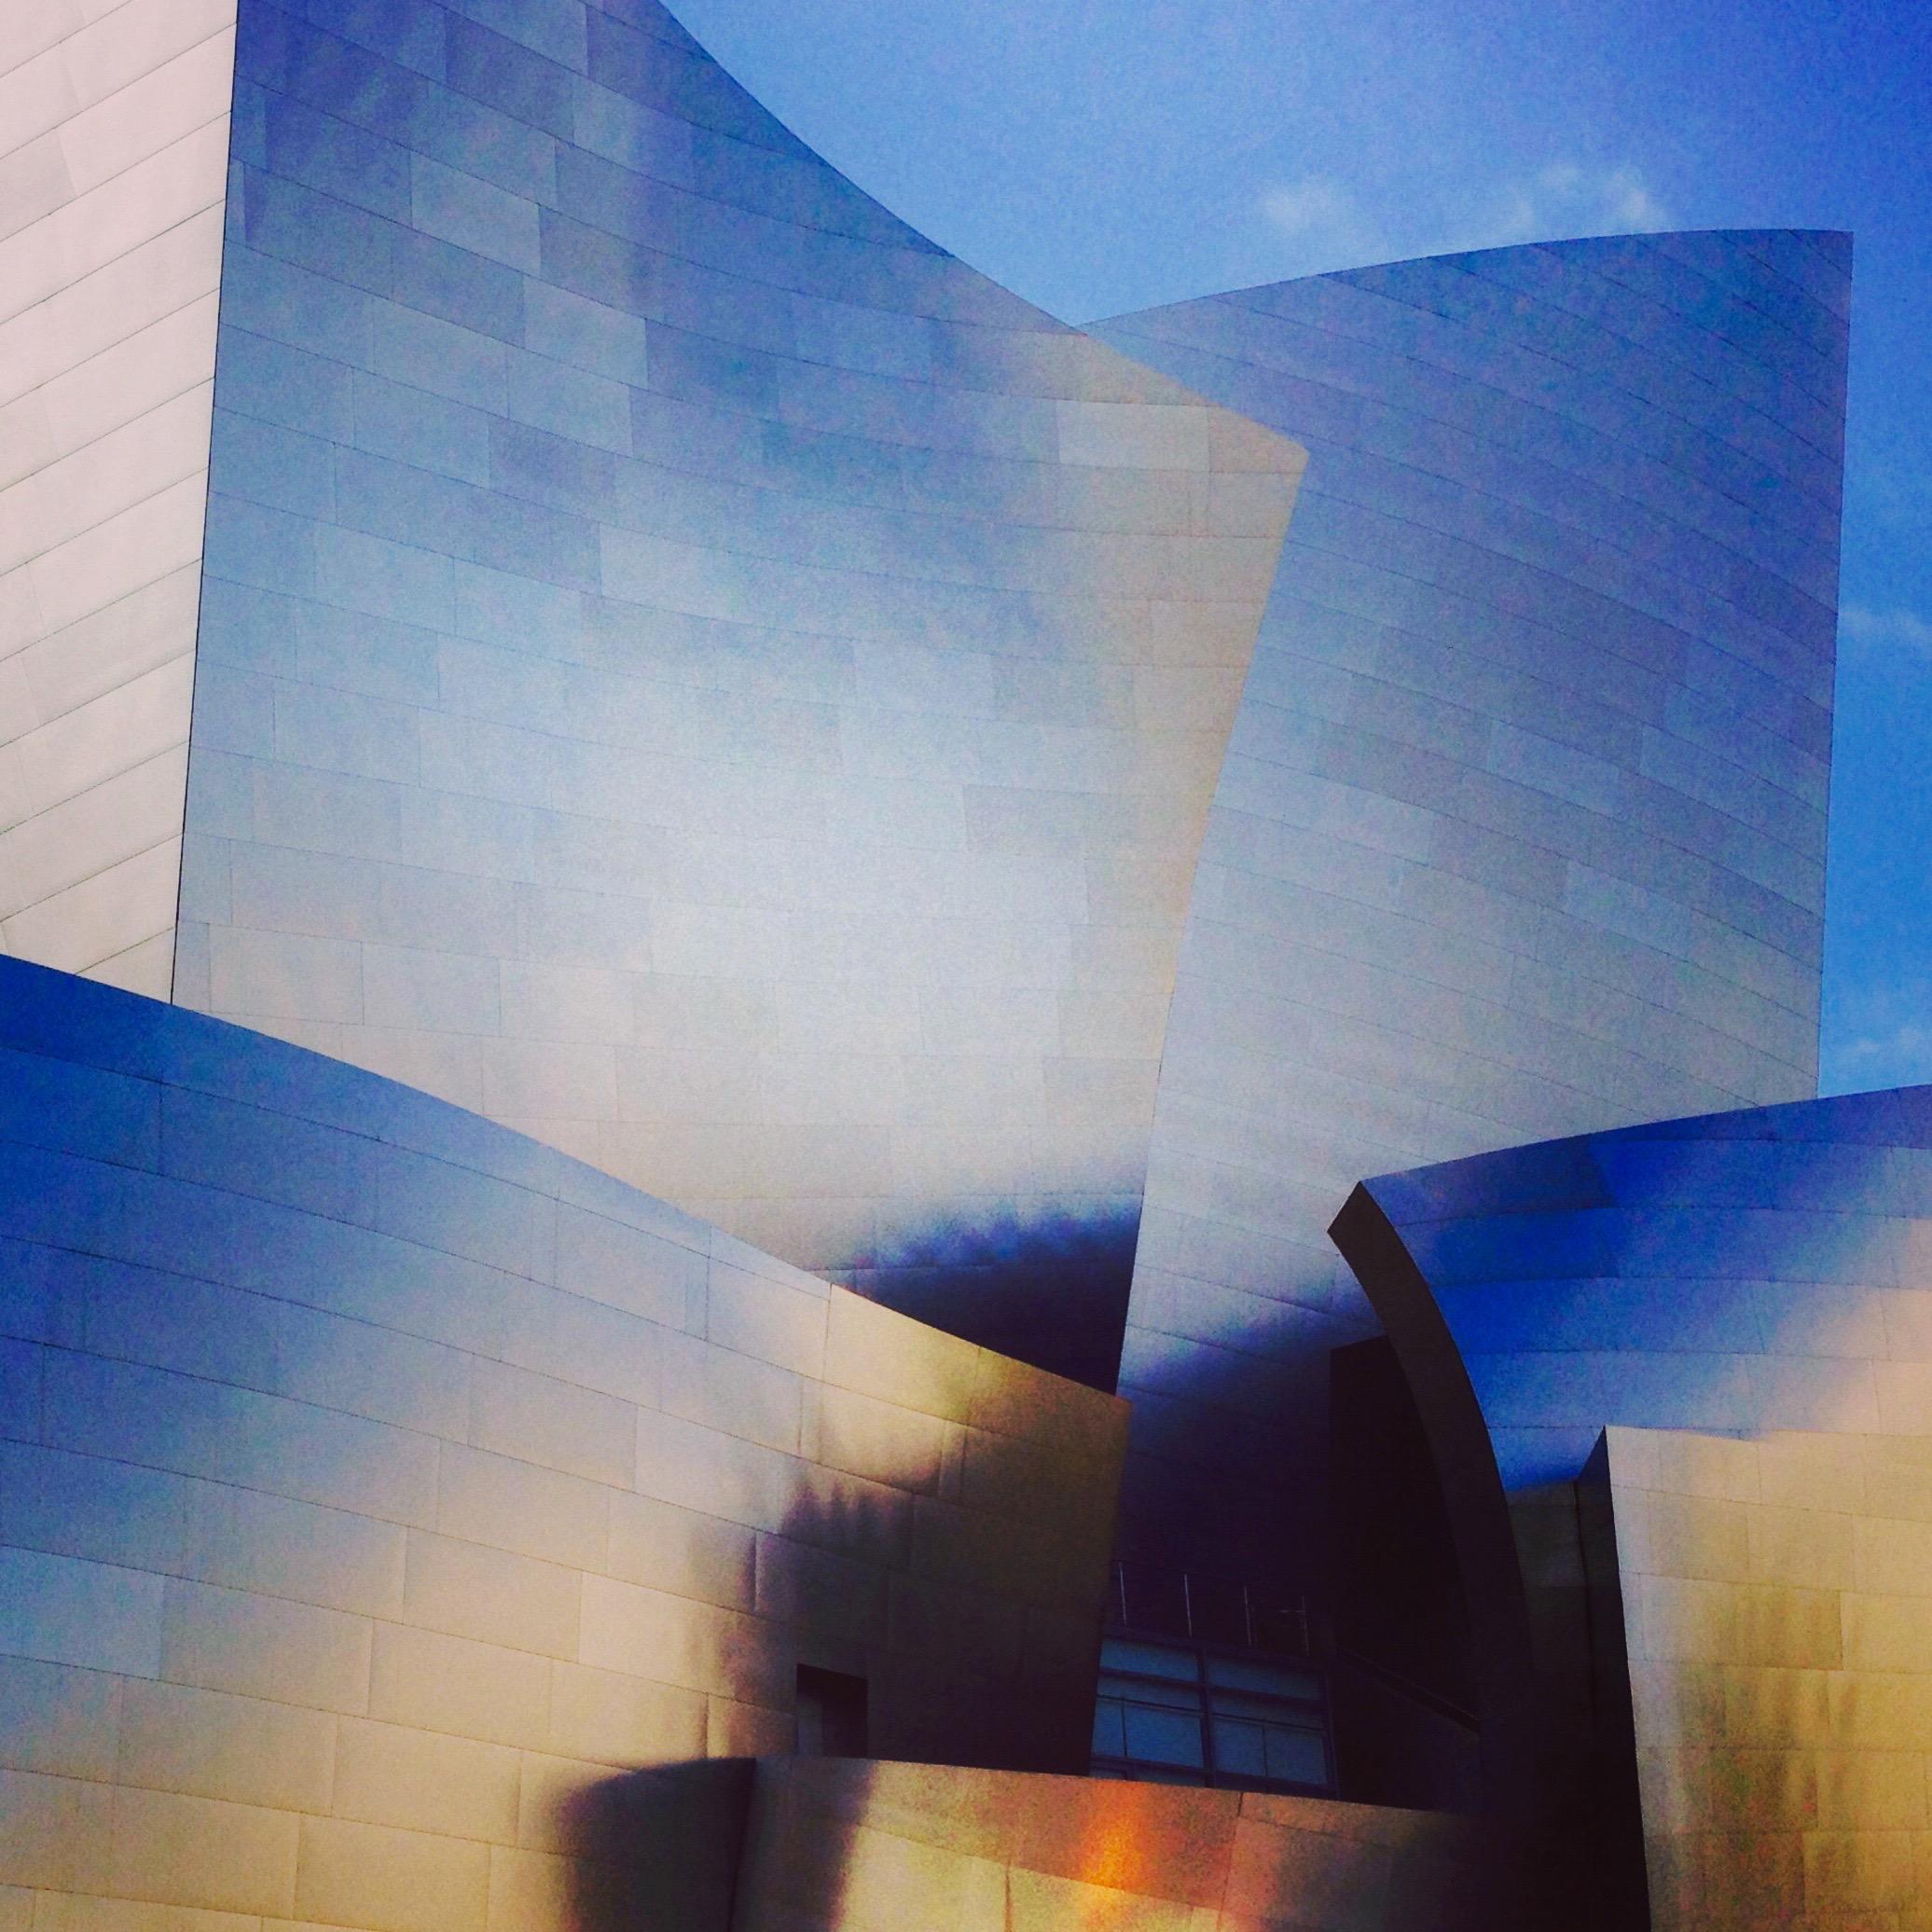 Walt Disney Concert Hall, Los Angeles - 3 Days*